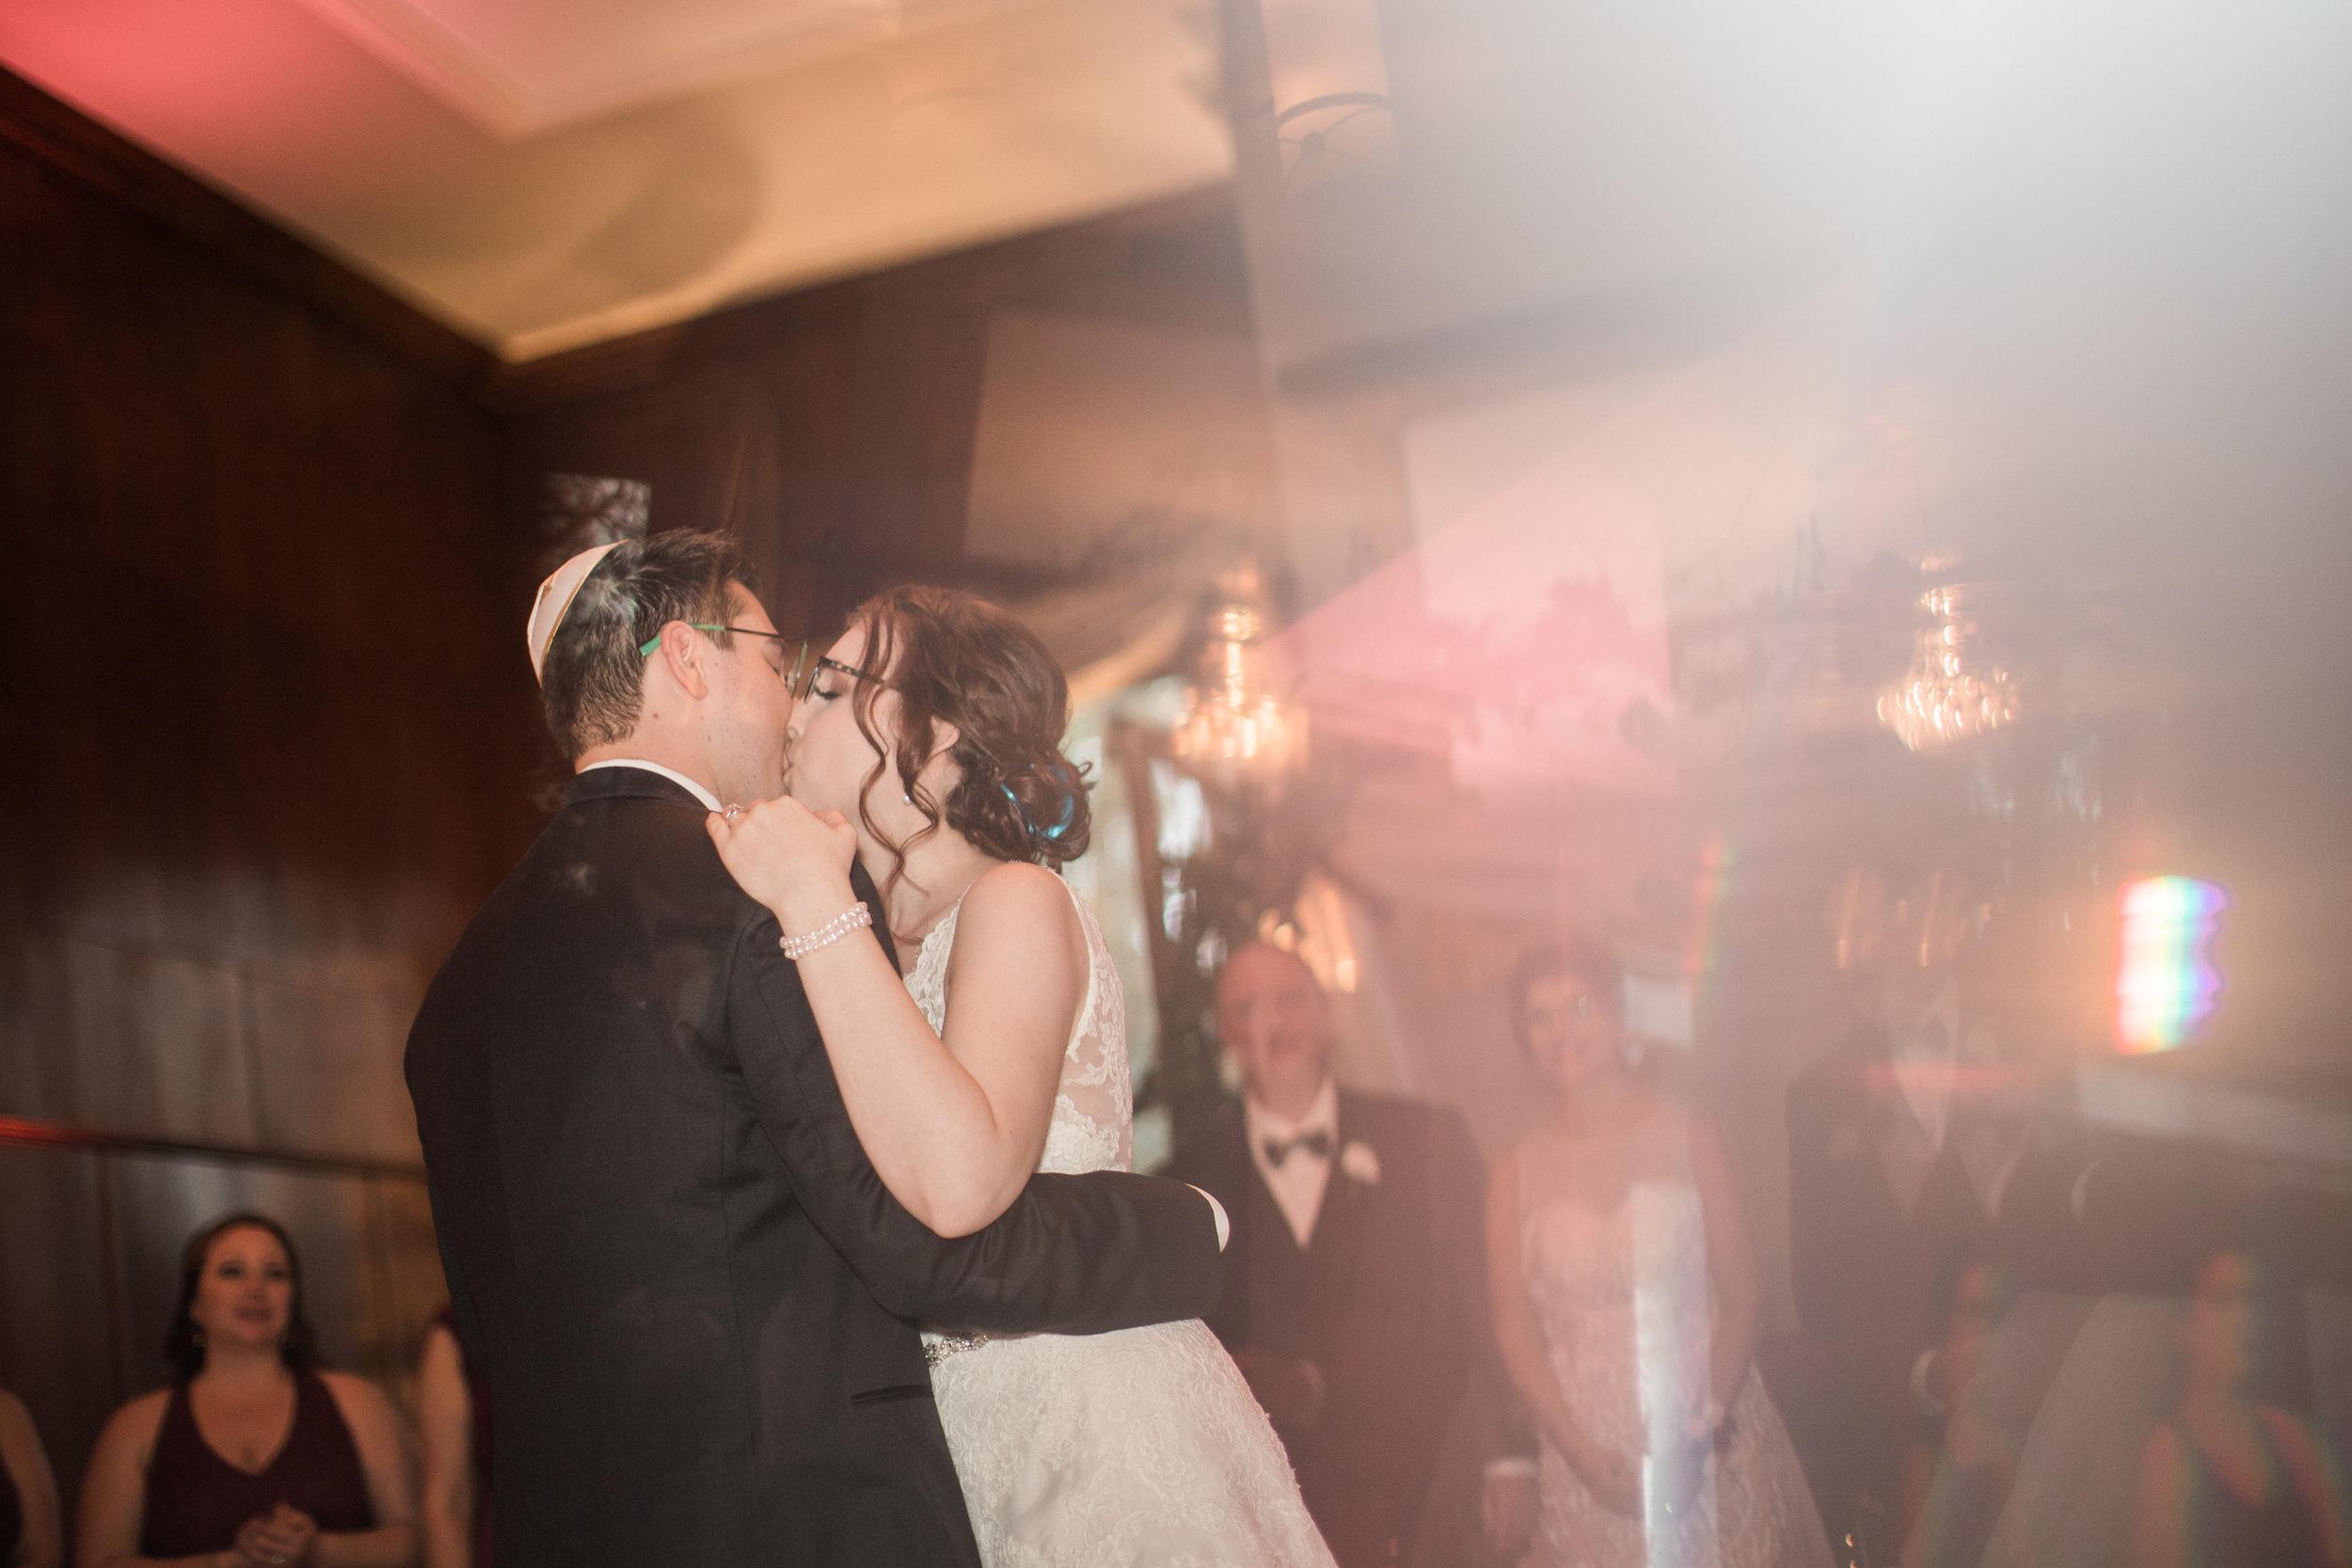 Harry Potter Wedding at Overhills Mansion Catonville Maryland Wedding Photographers Megapixels Media (97 of 134).jpg